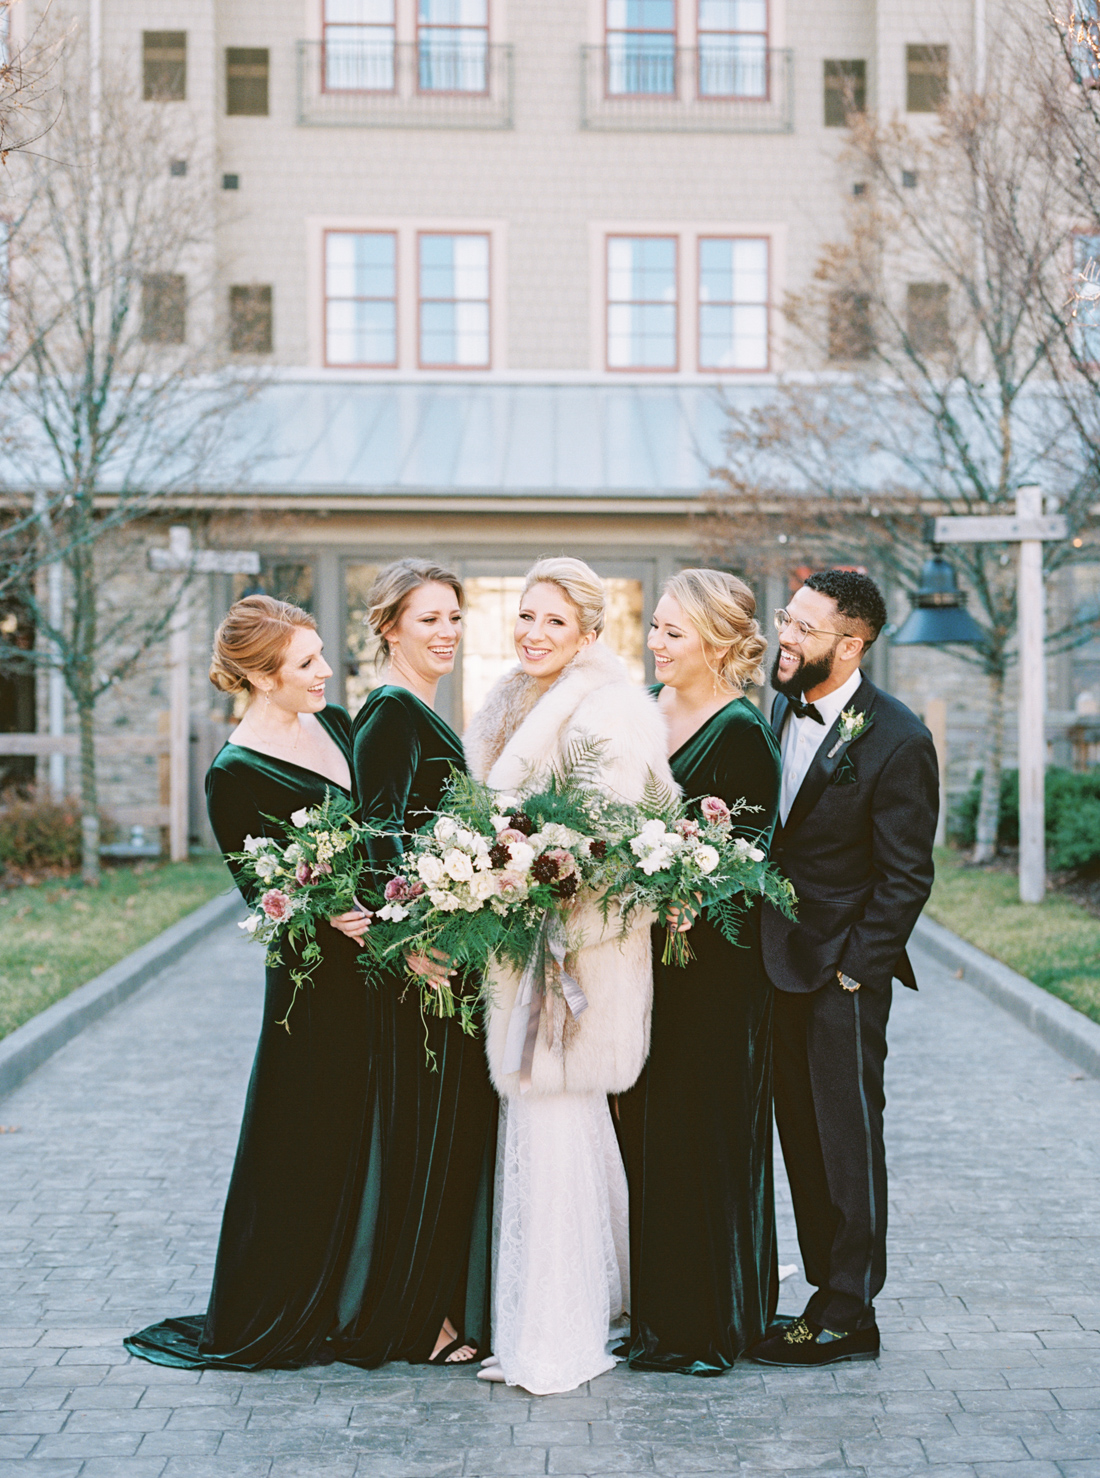 winter-bridesmaids-dresses-velvet-green-wedding